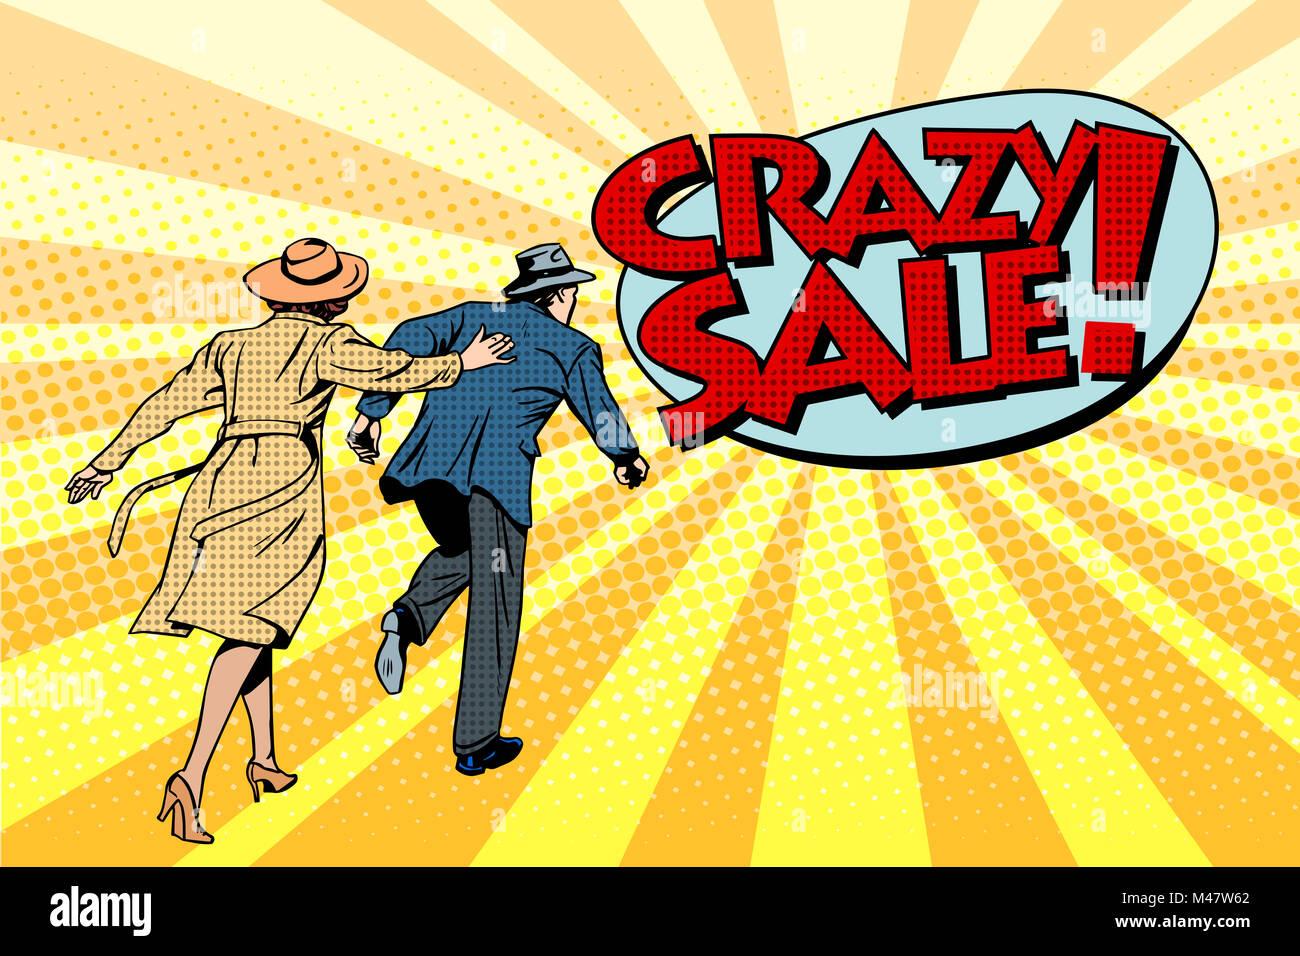 Crazy sale super discounts - Stock Image